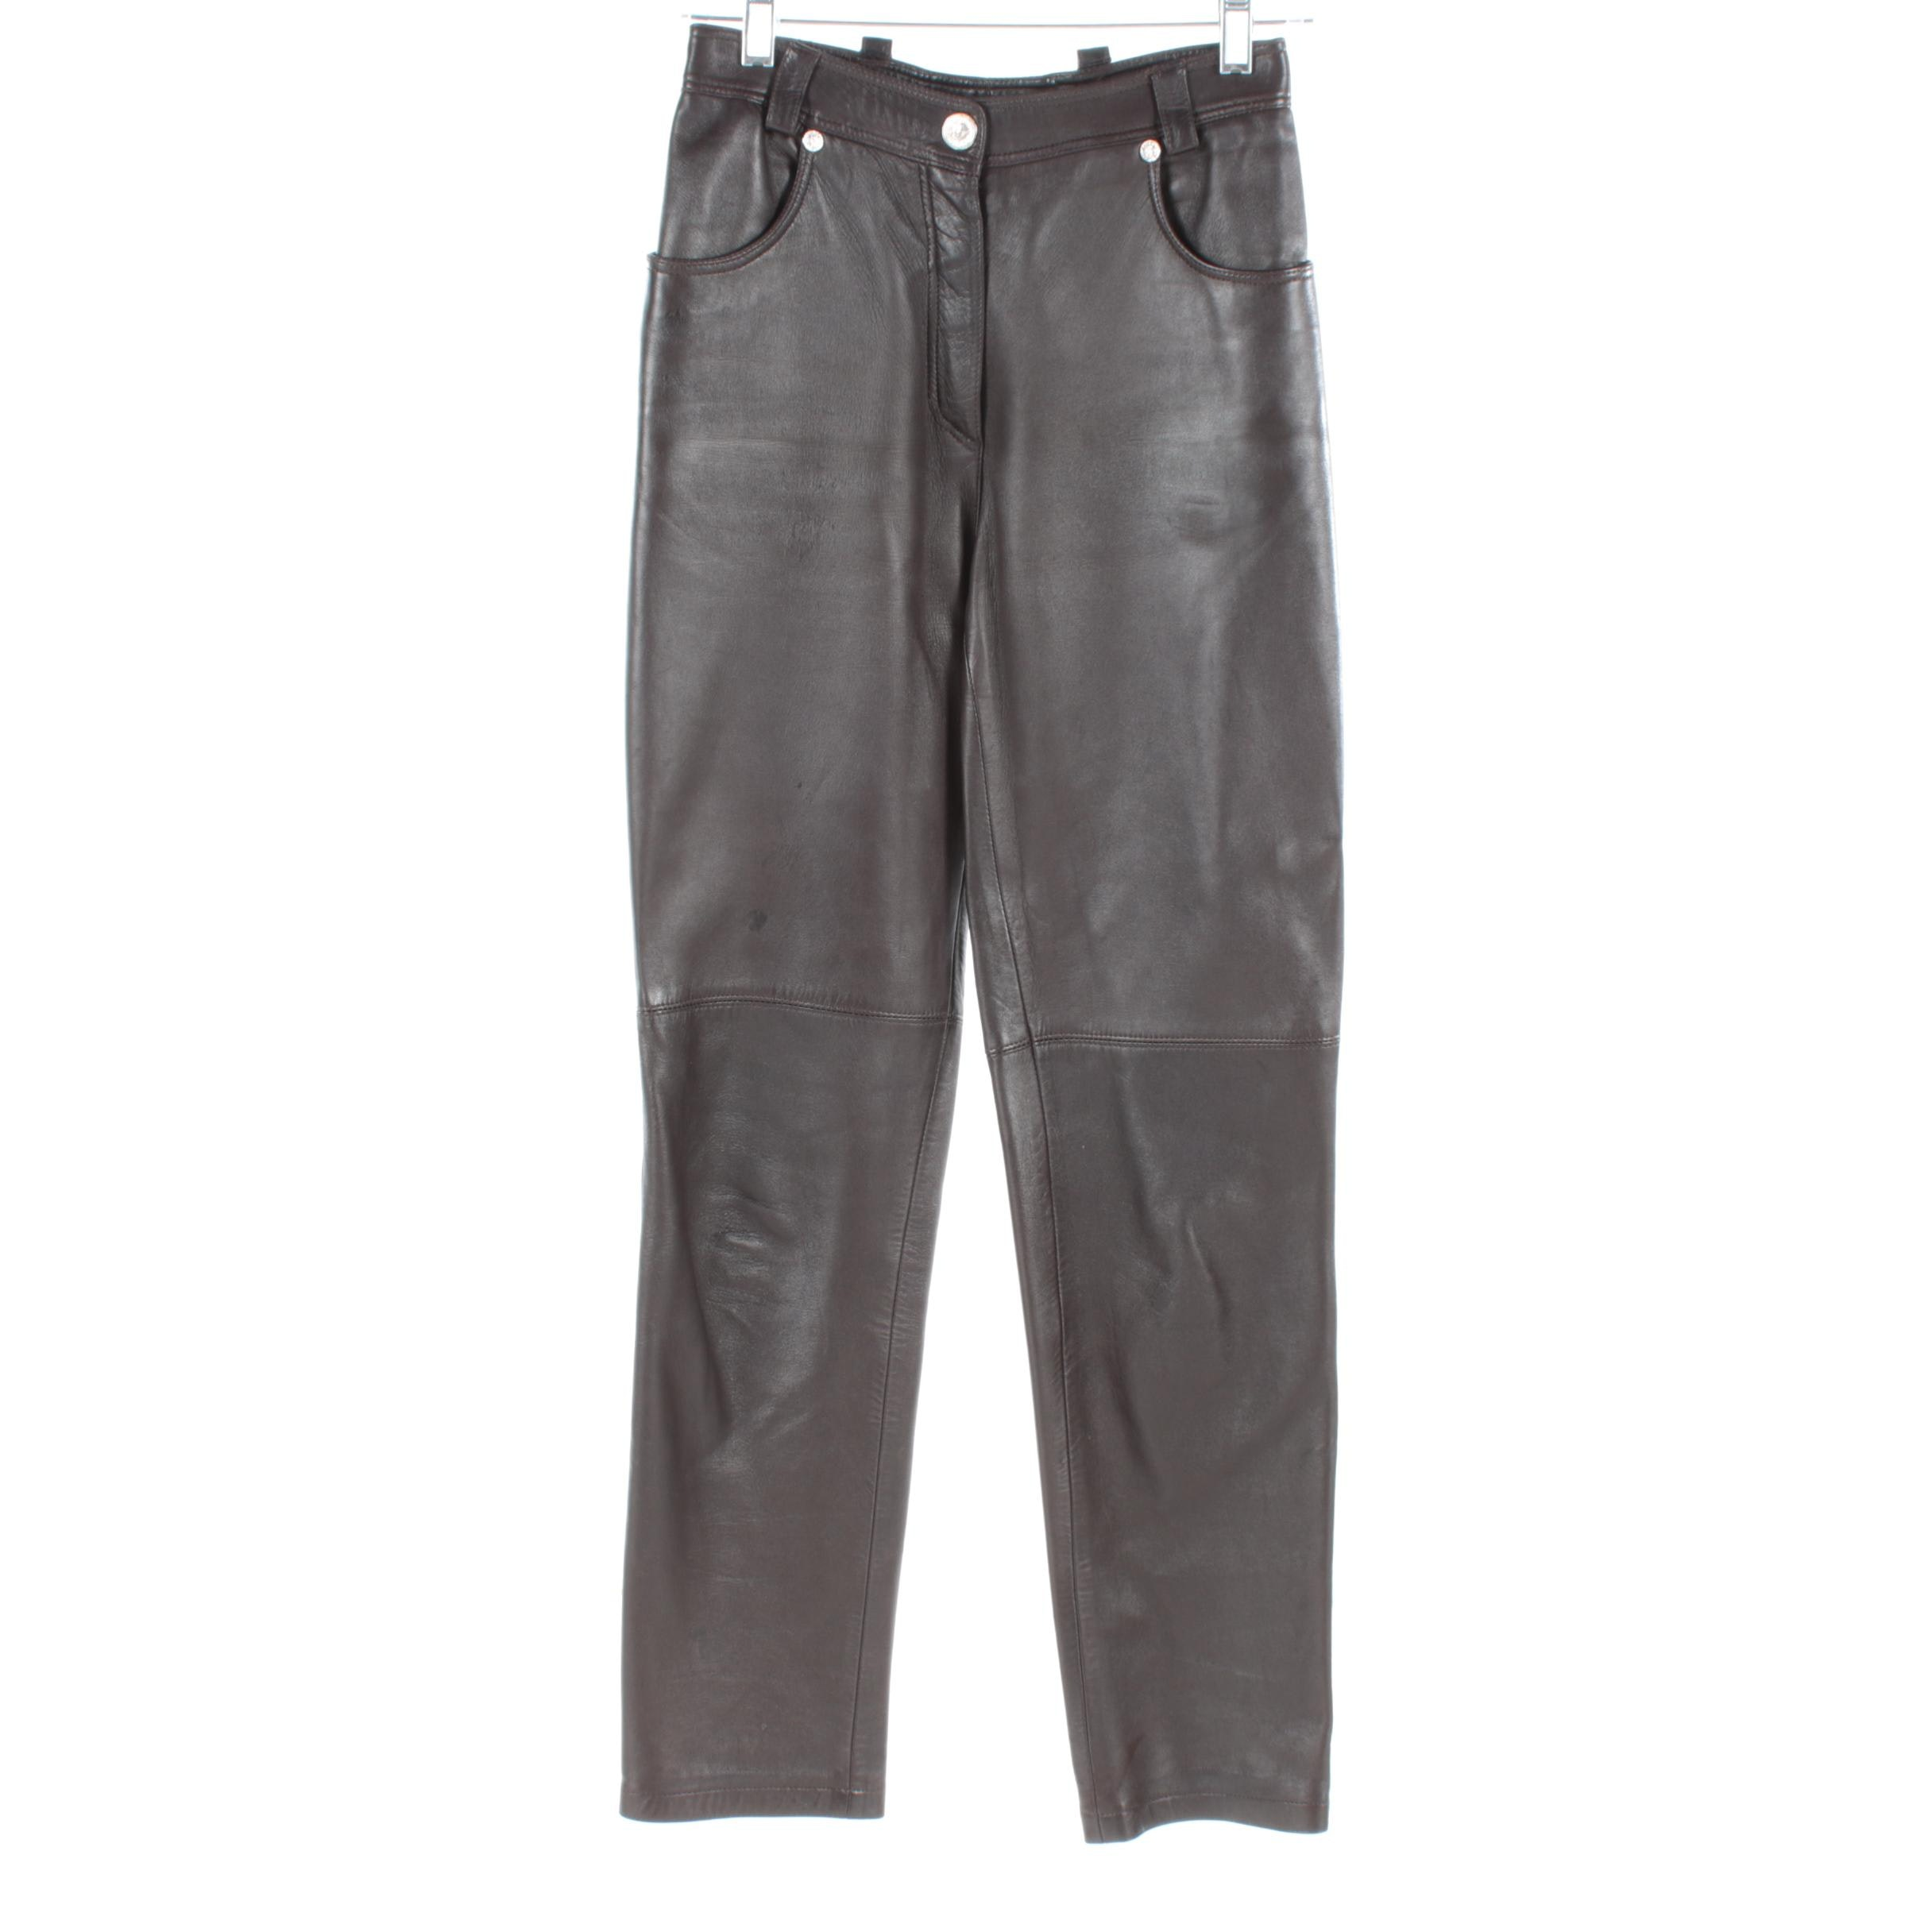 Circa 1980s Vintage Gianni Versace Lambskin Pants